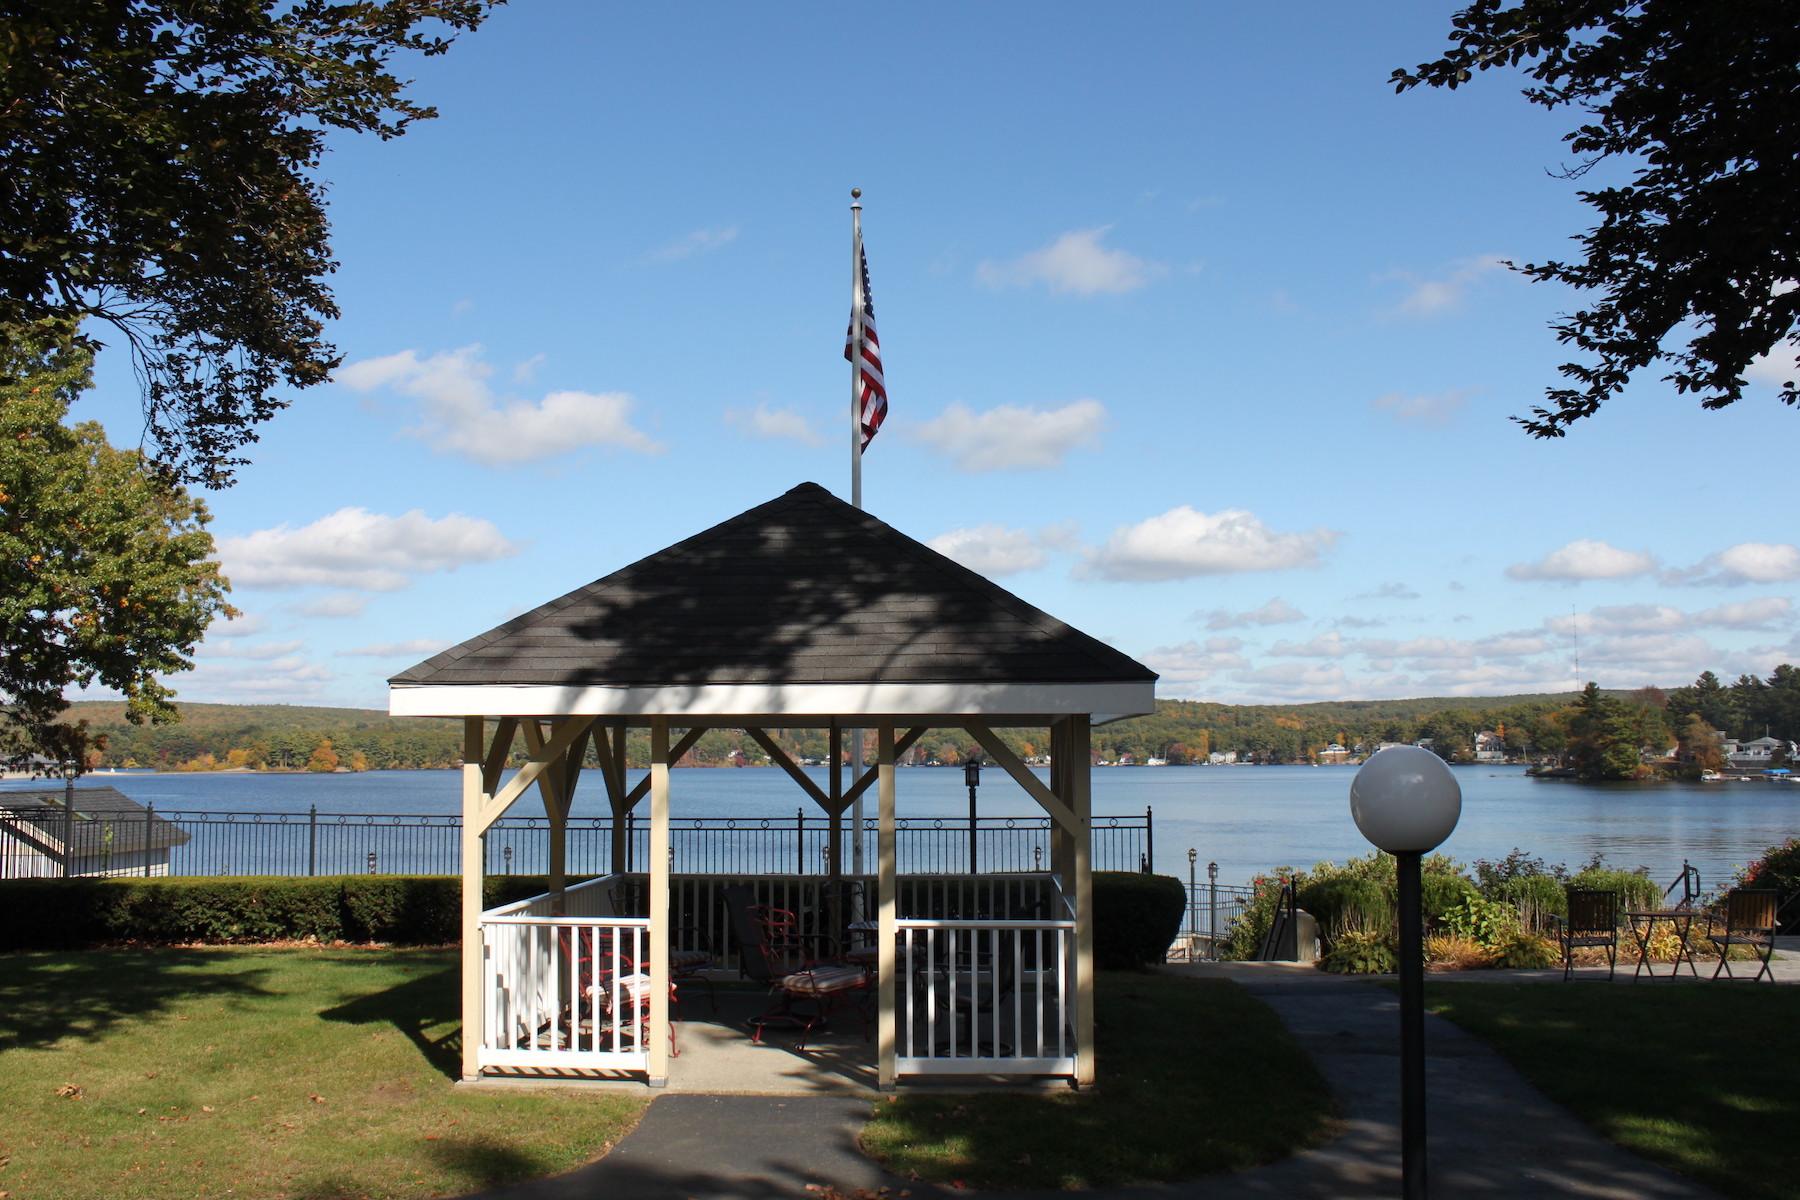 Condominiums 为 销售 在 Garden Style Condo - Webster Lake 704 Beacon Park, Unit 704 Webster, 马萨诸塞州 01570 美国